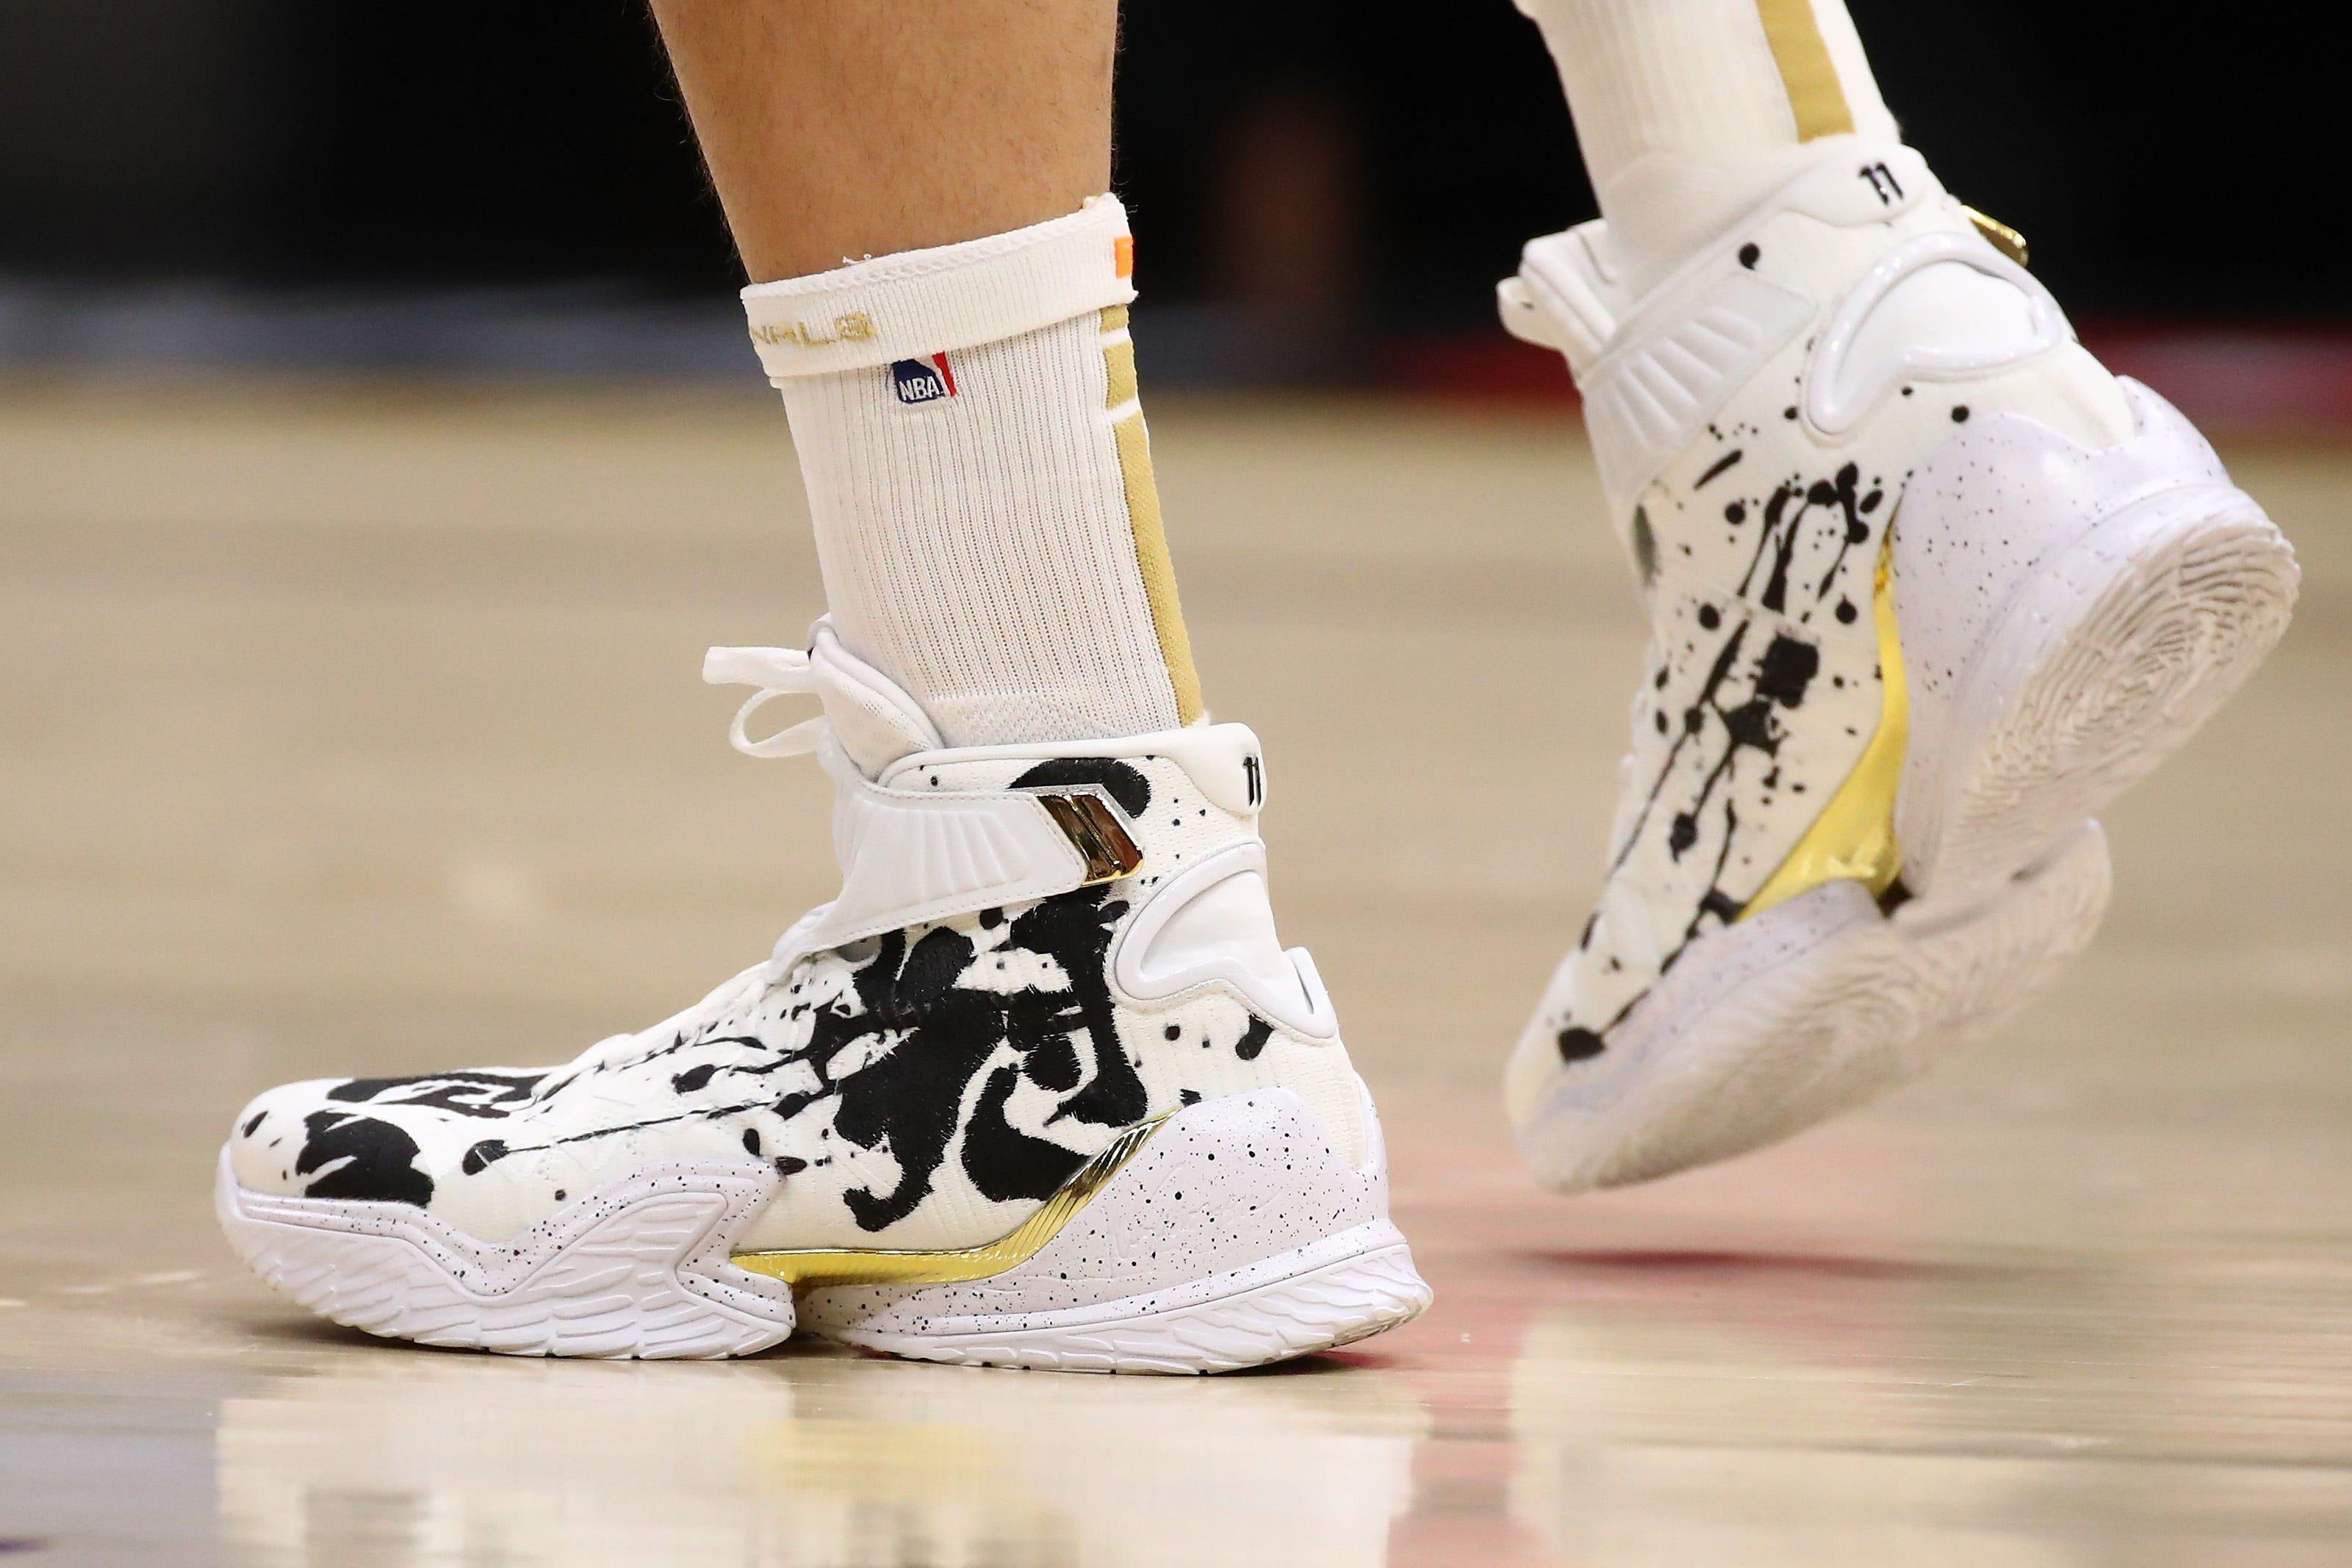 Ranking the 10 Biggest NBA Shoe Deals